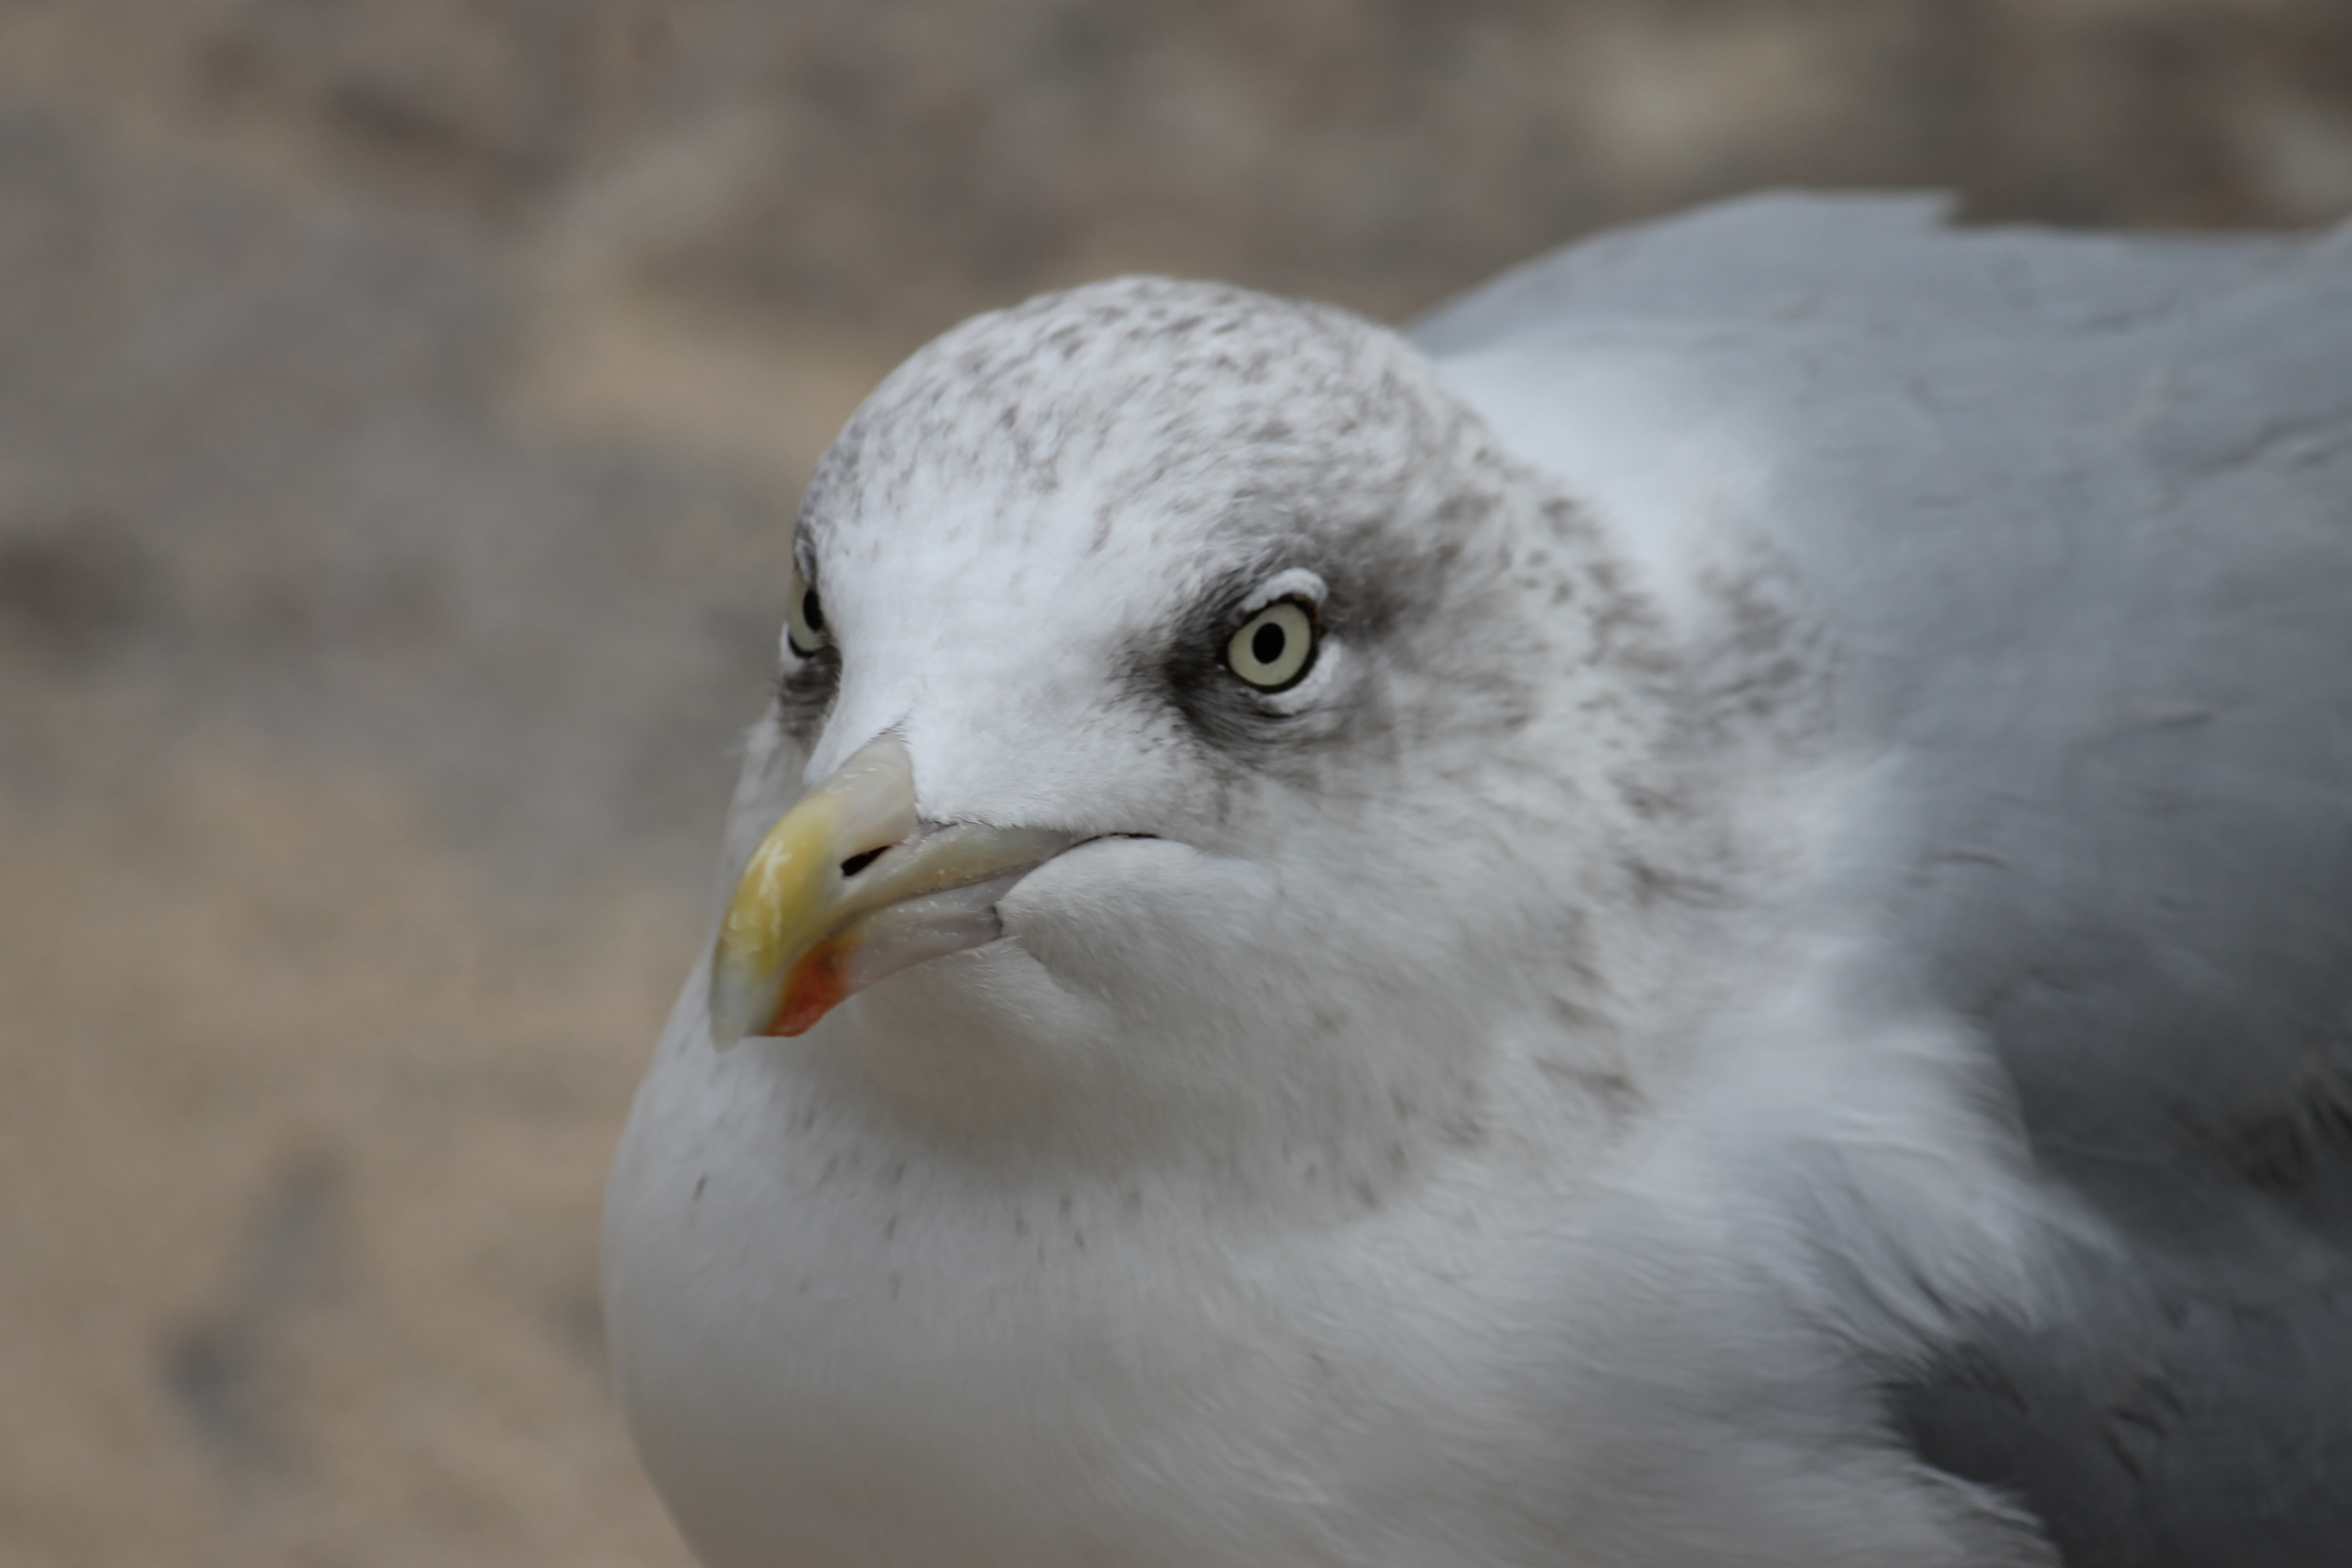 The big Seagulls